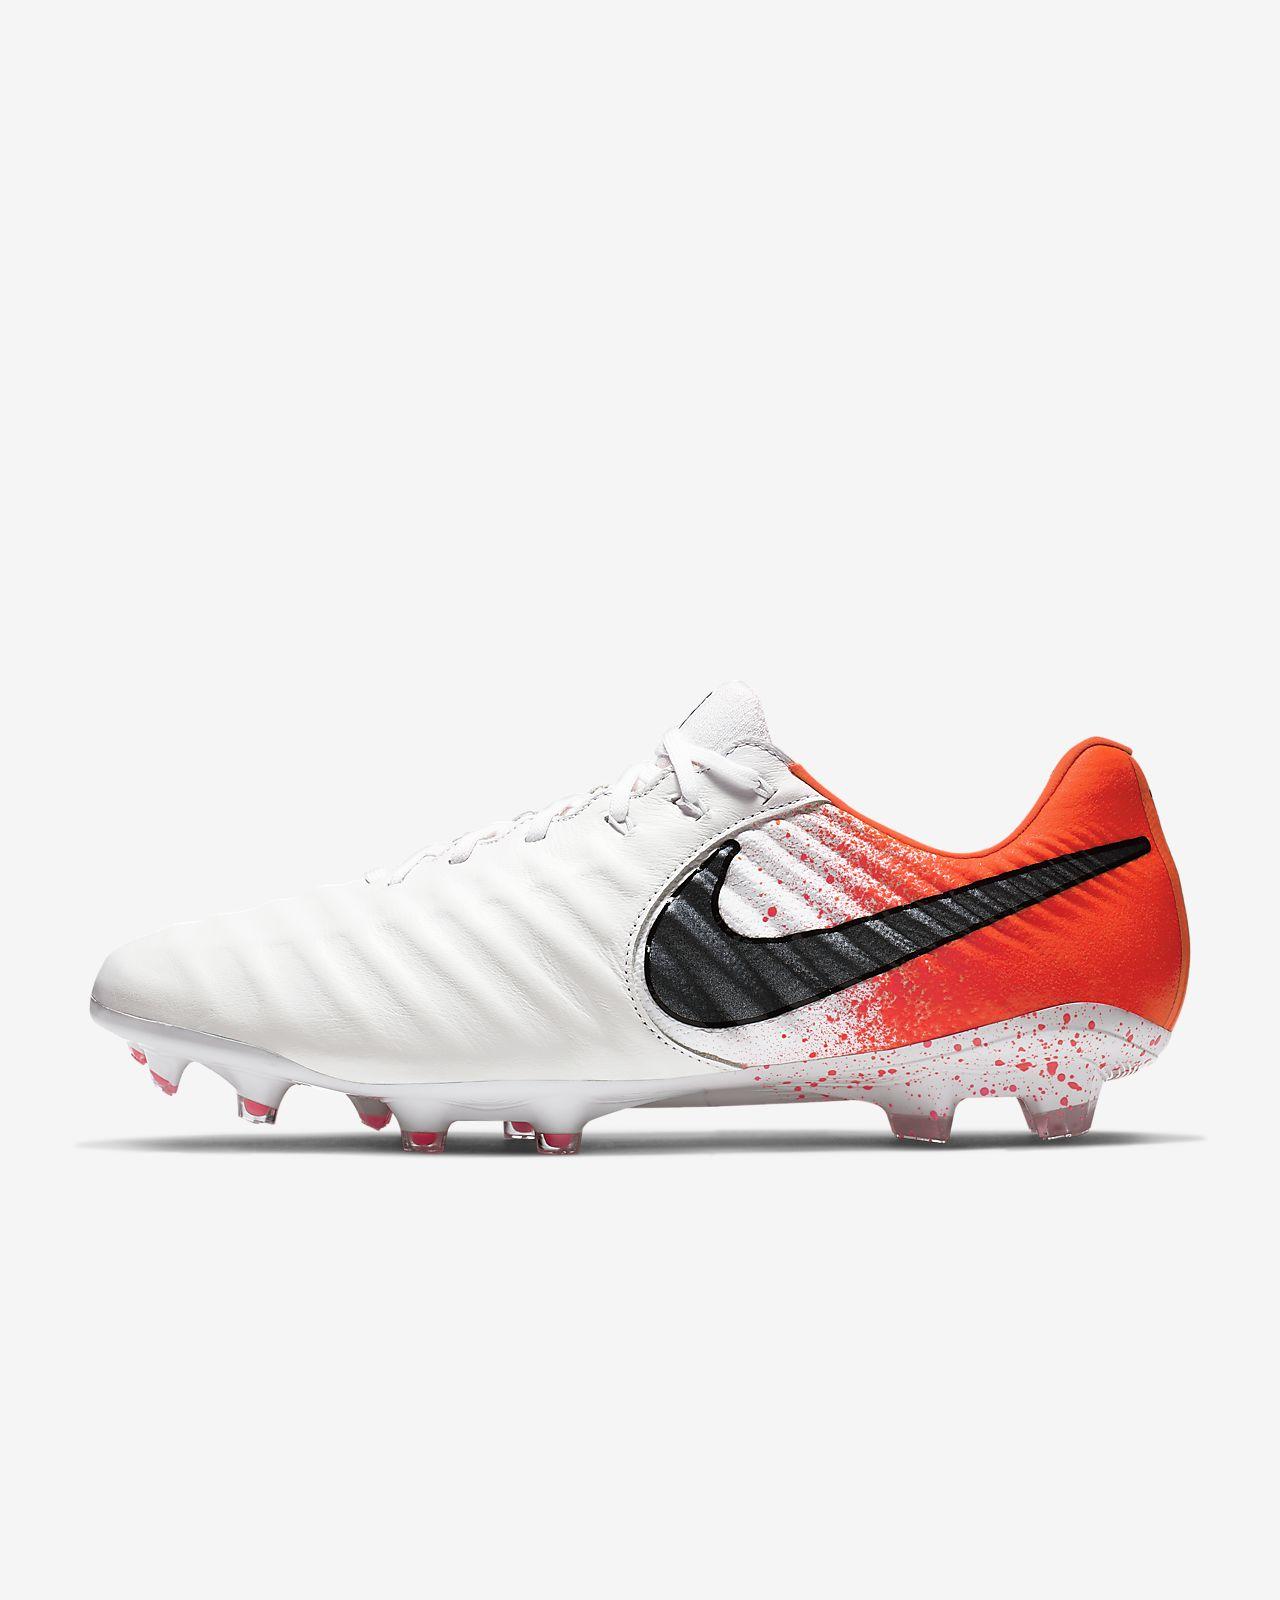 online store c3027 8fc3b ... Fotbollssko för gräs Nike Legend 7 Elite FG